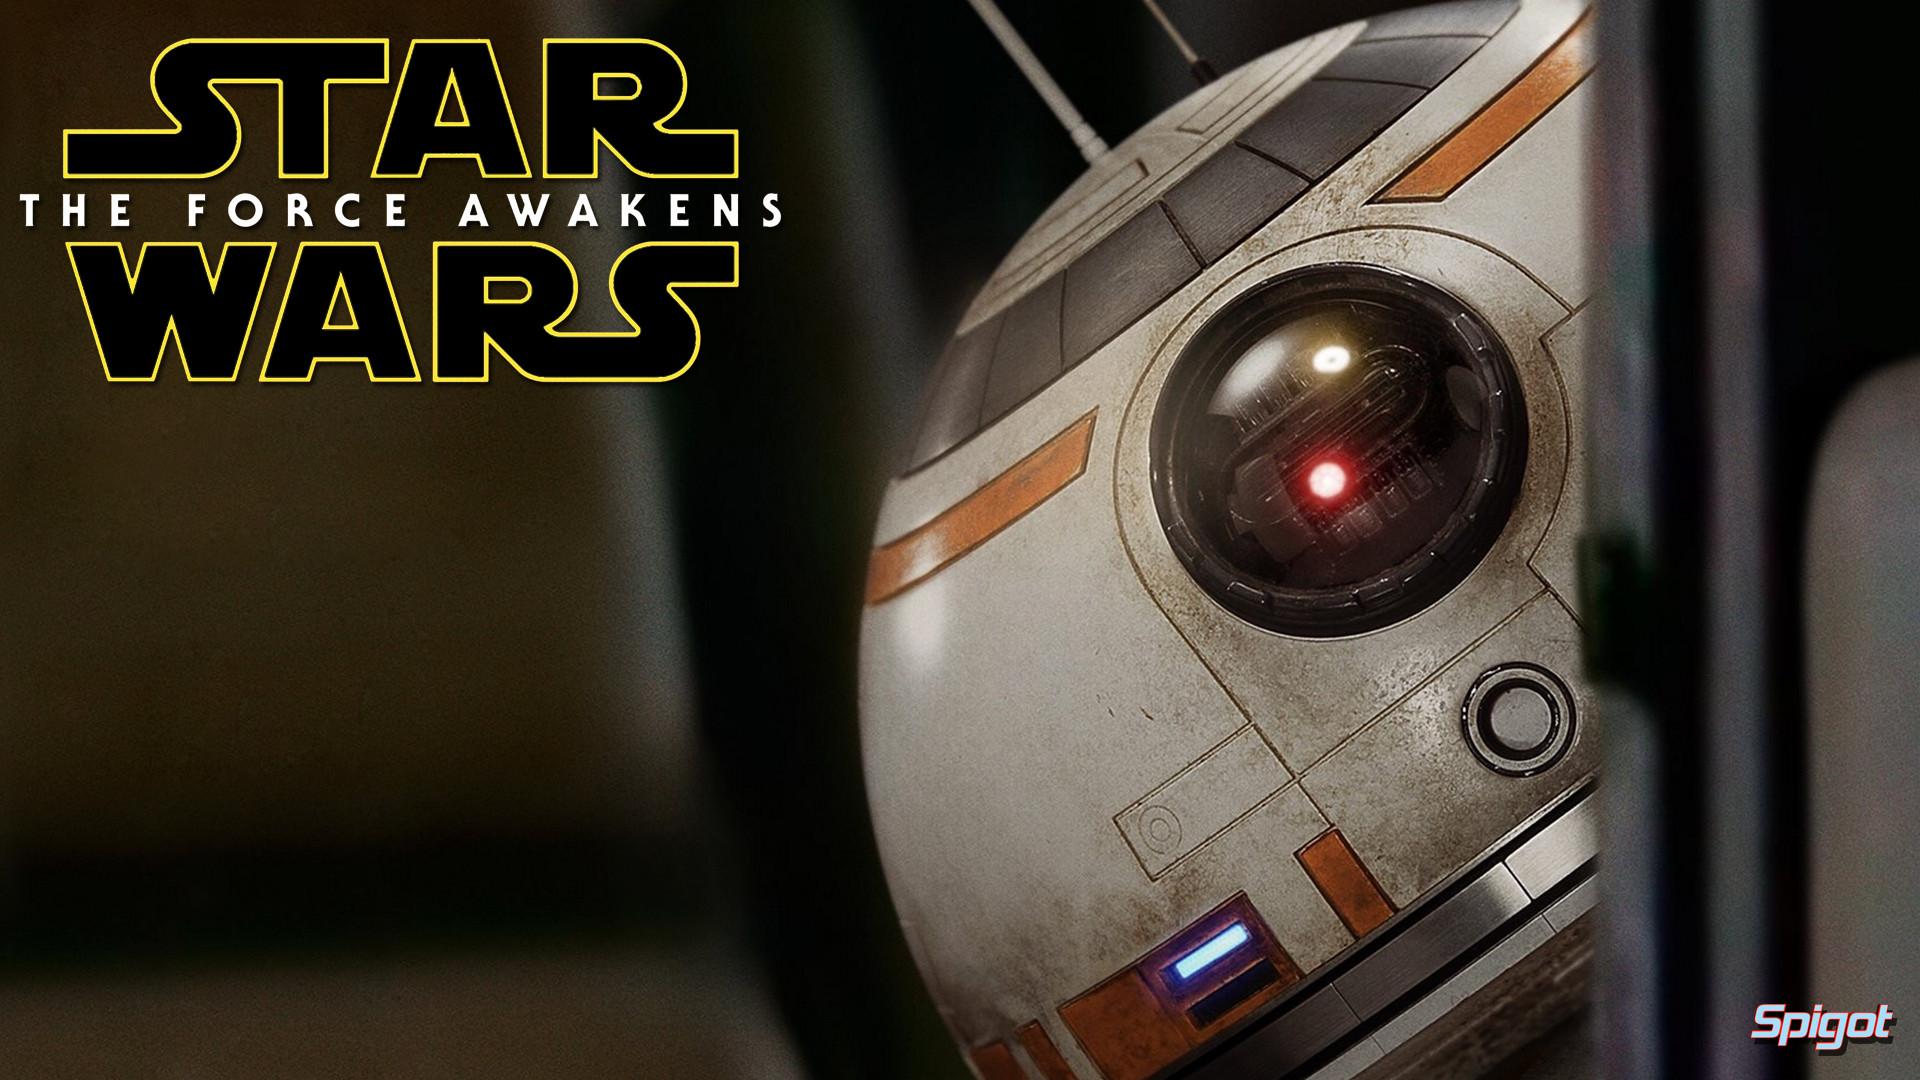 Star Wars Bb8 Wallpaper 69 Images